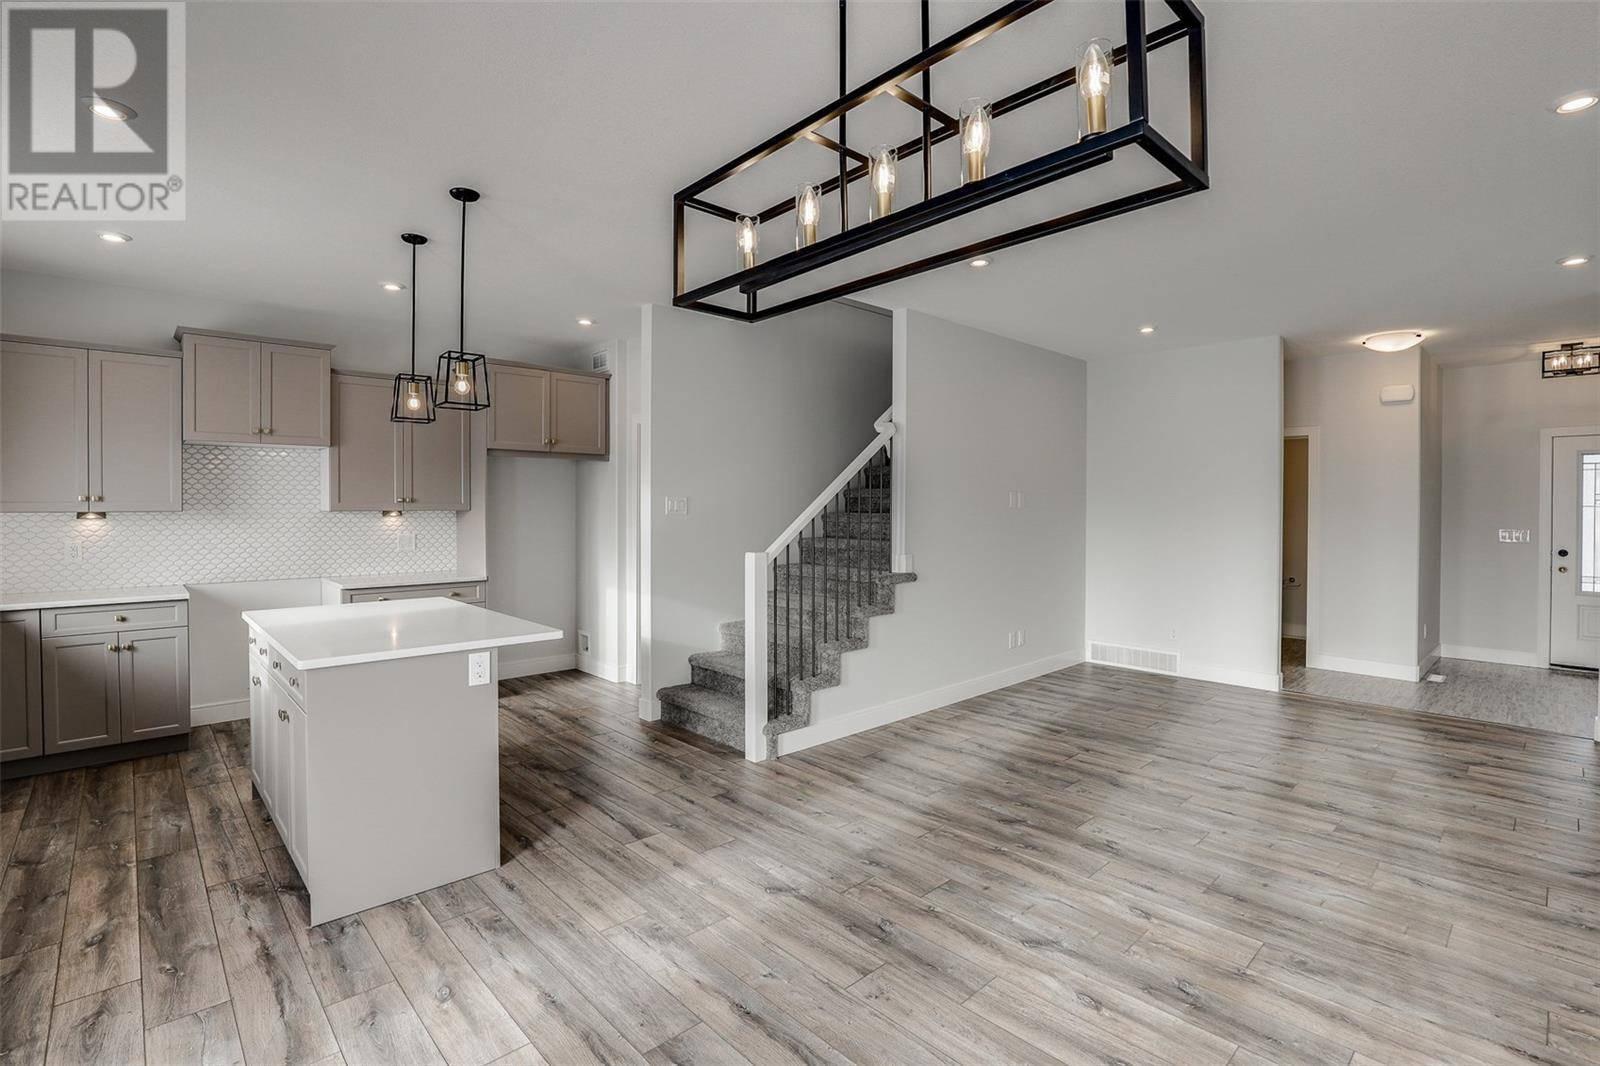 House for sale at 322 Burgess Cres Saskatoon Saskatchewan - MLS: SK783410